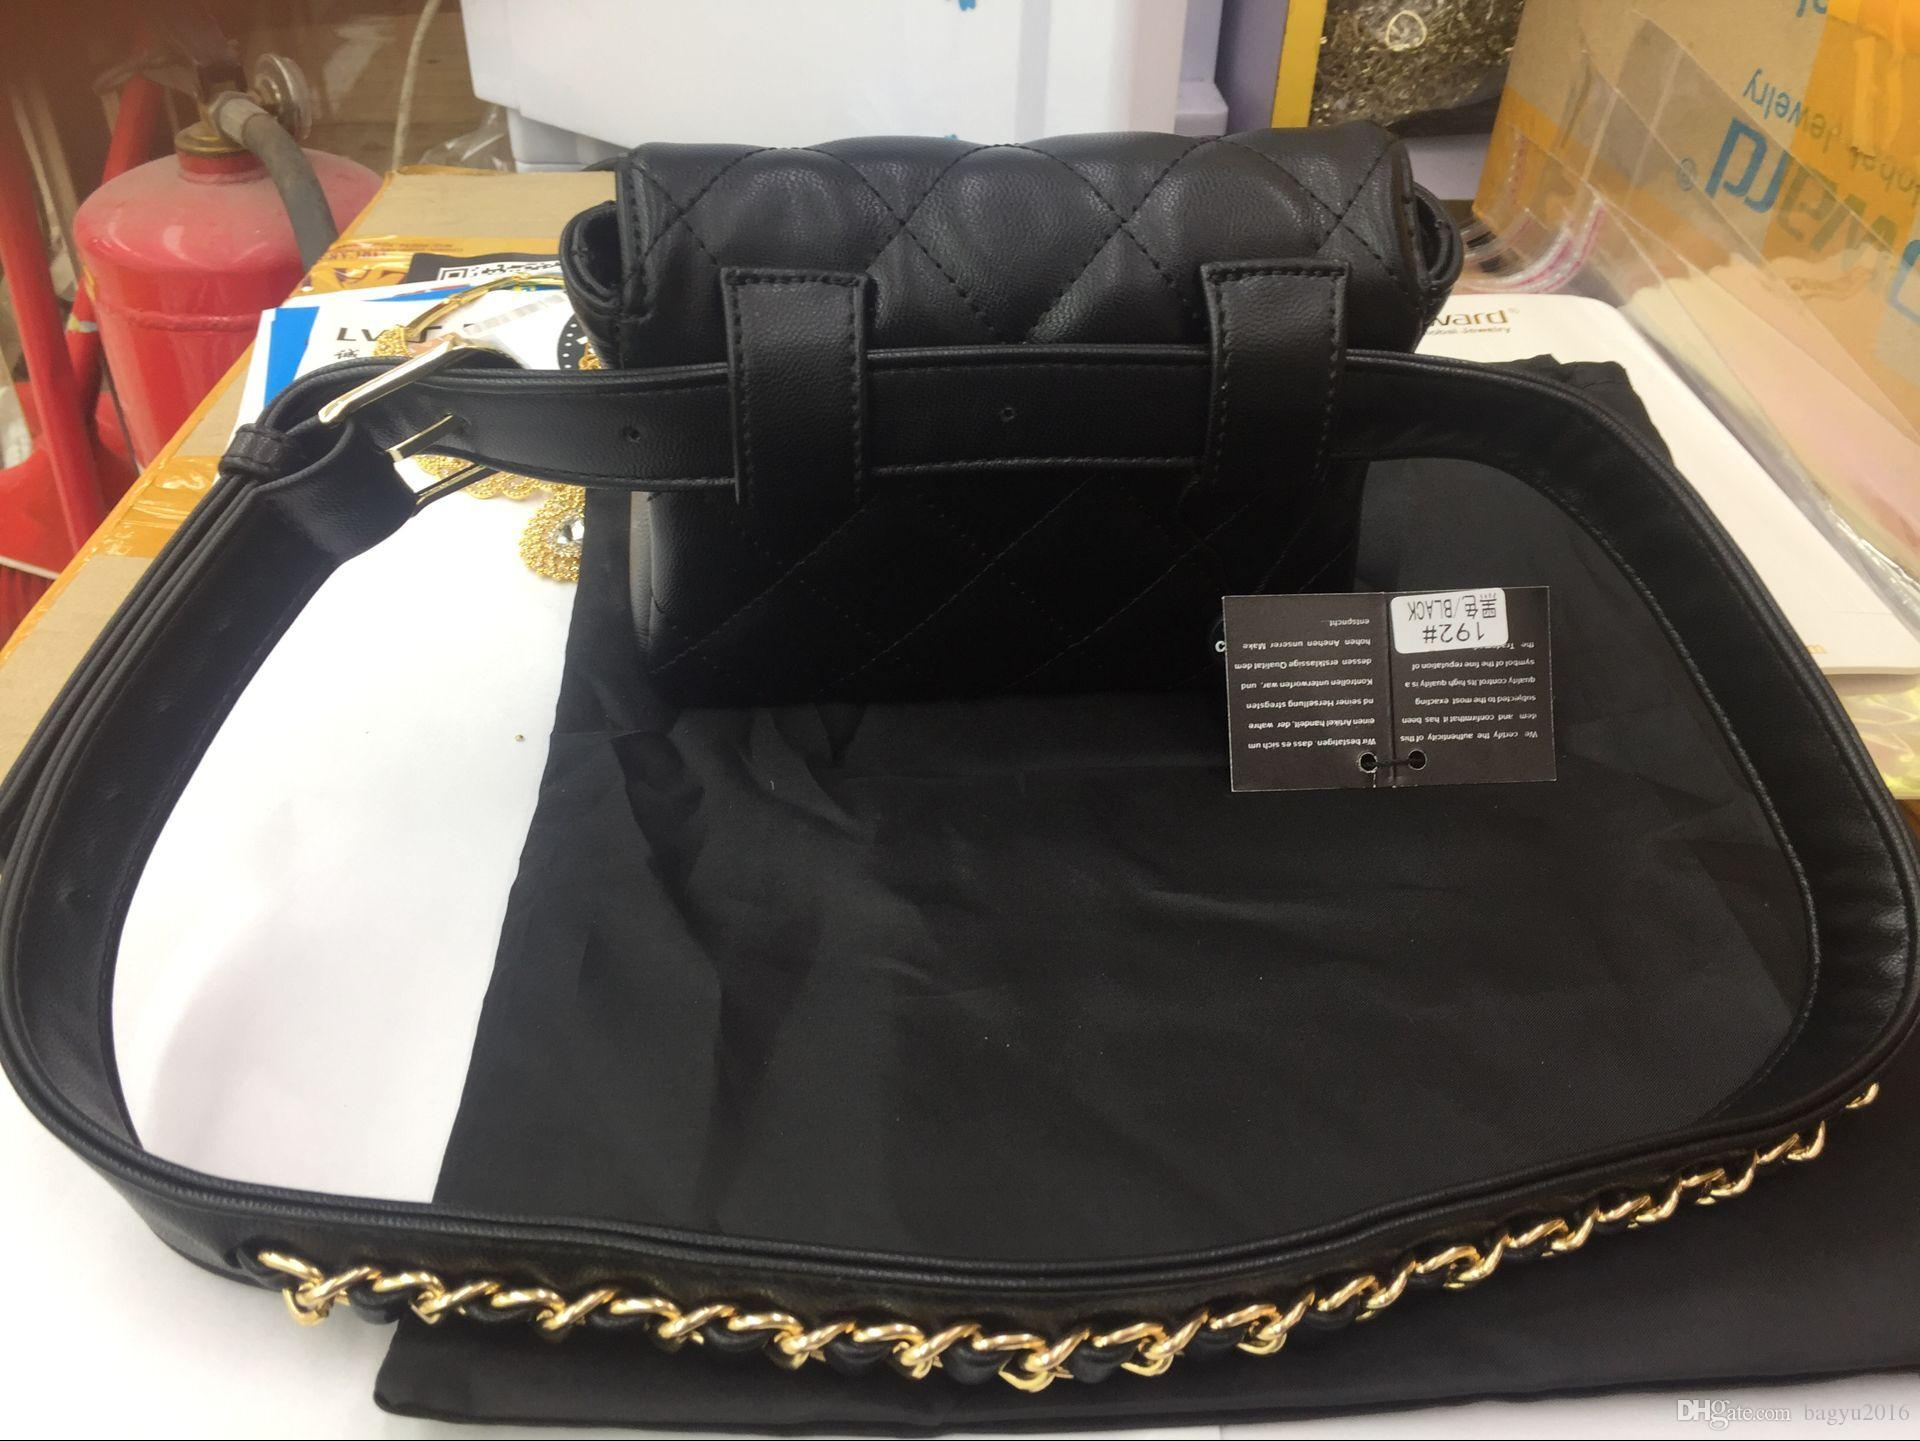 d29219530718 Thread Leather Women Bags Waist Bag Flap Chains Belt Bag Mini Waist Flap  Bag Black Red Fashion Handbags Bags For Sale From Bagyu2016